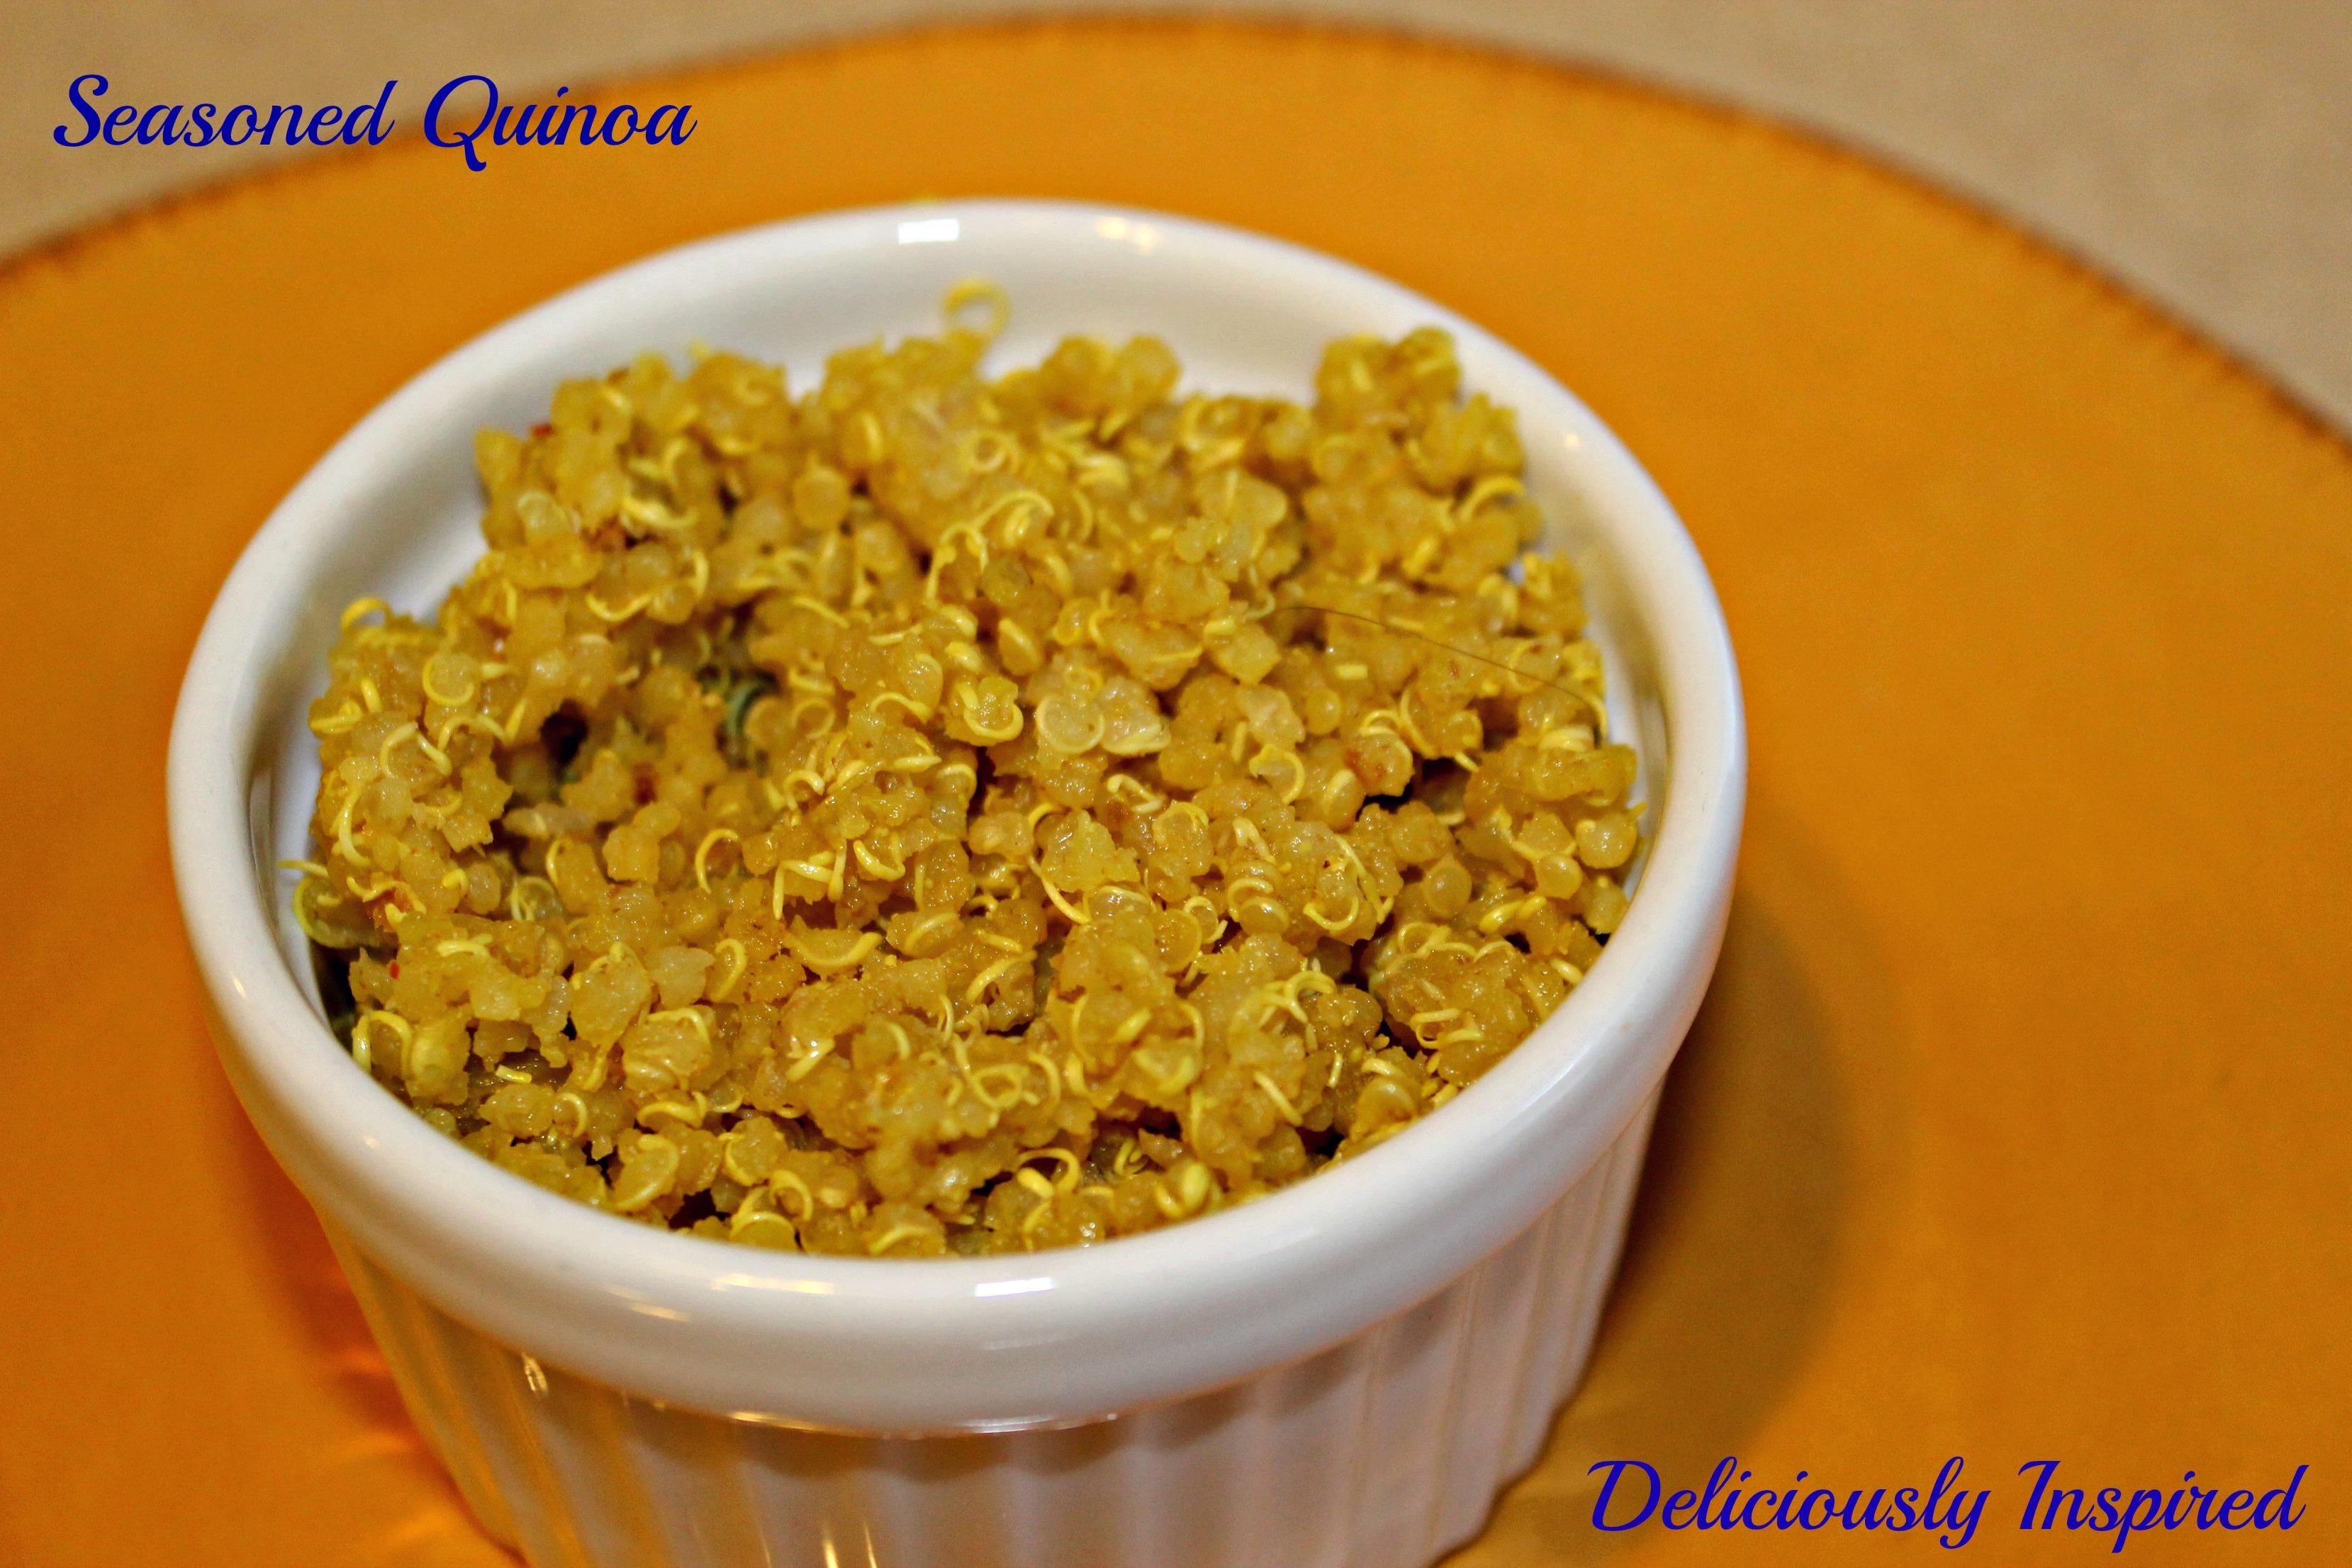 Seasoned Quinoa